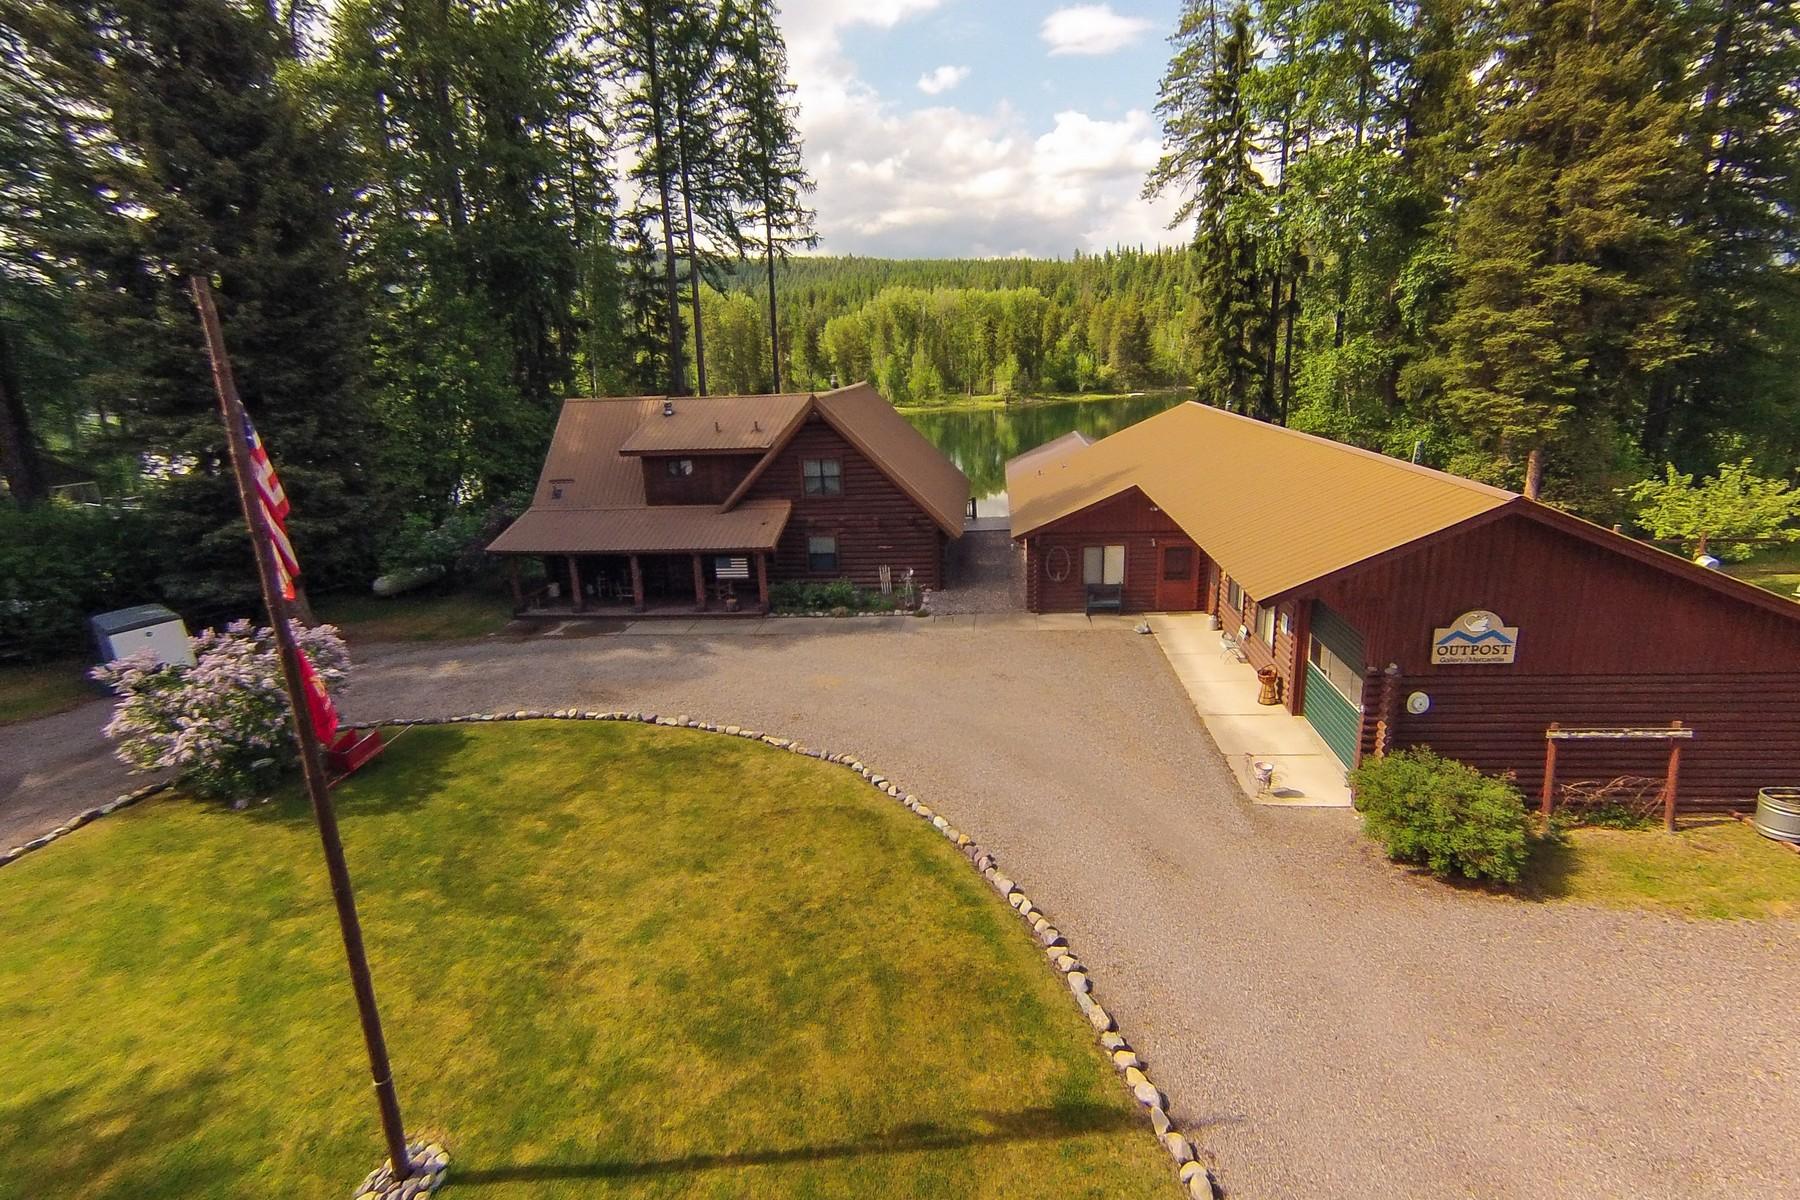 獨棟家庭住宅 為 出售 在 Swan River Log Home 1097 MT Highway 209 Bigfork, 蒙大拿州, 59911 美國